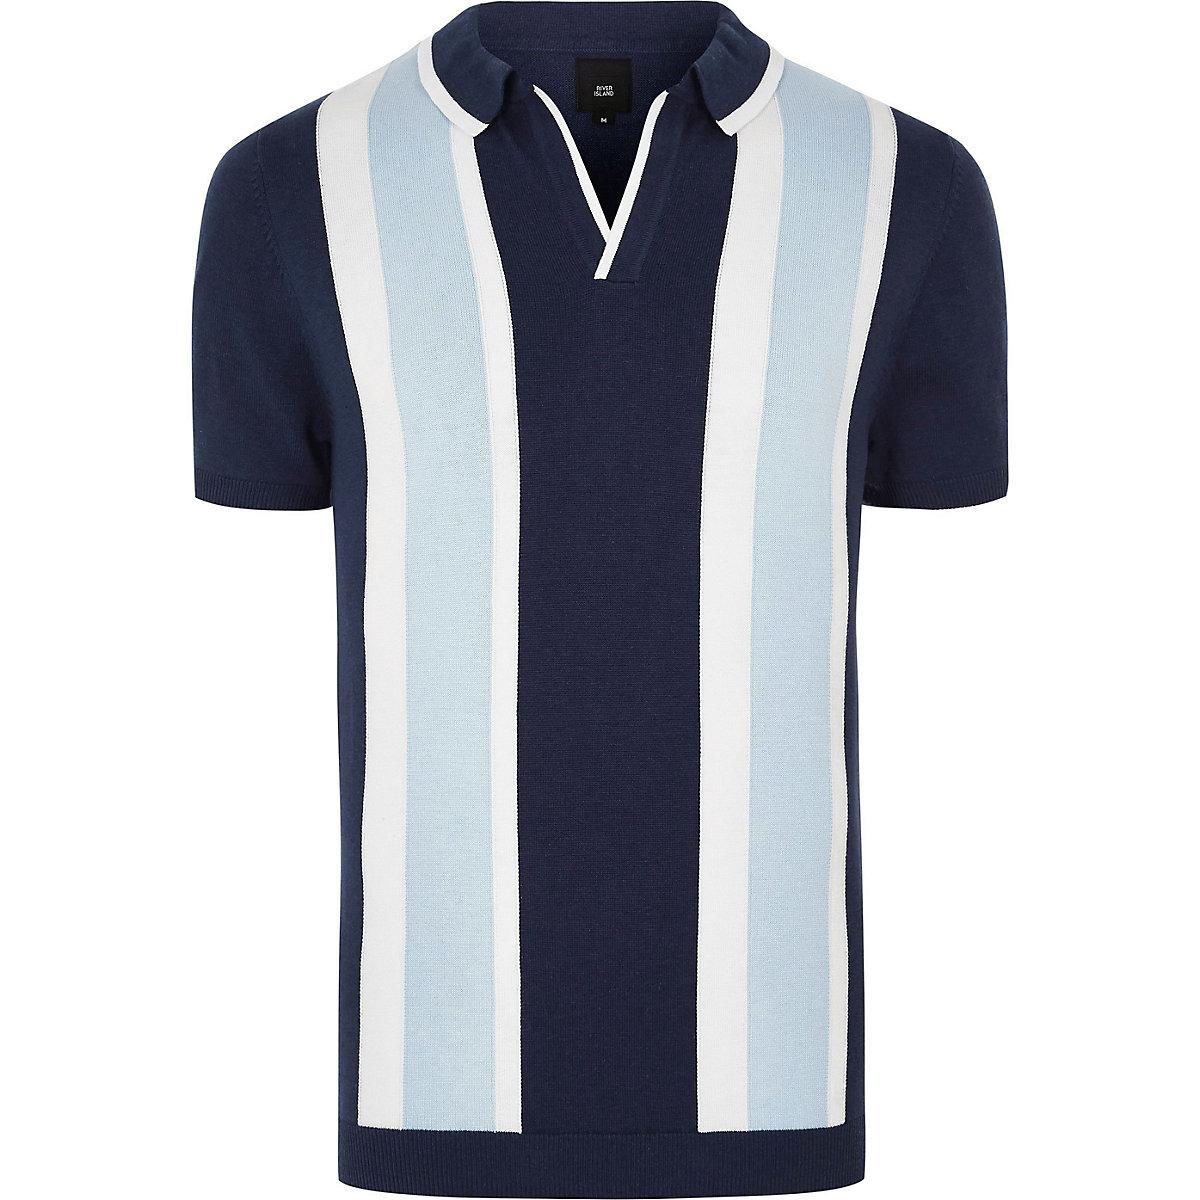 Big & tall blue stripe revere knit polo shirt